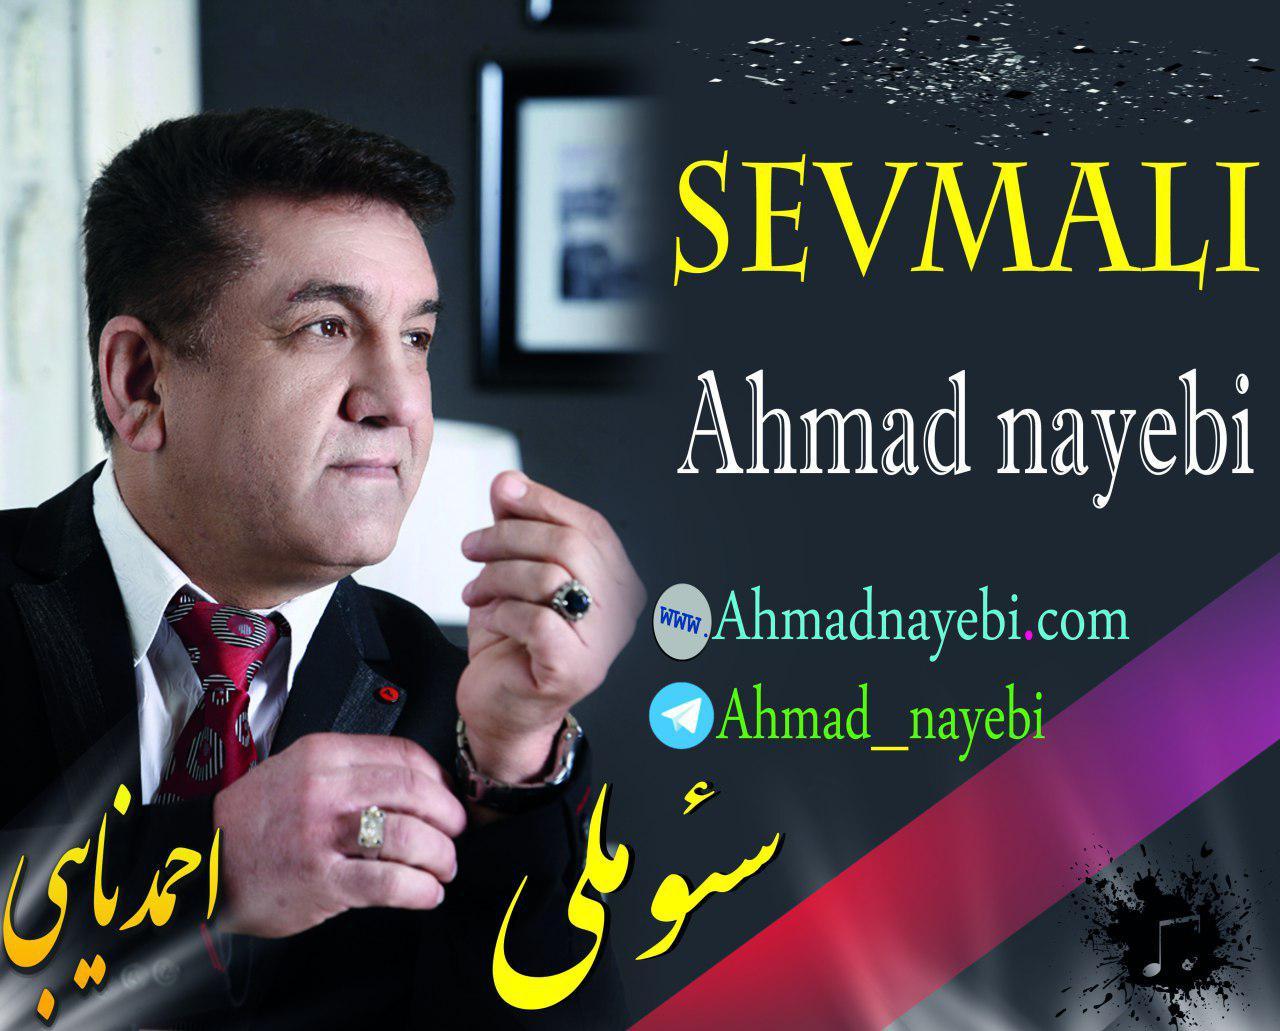 http://s9.picofile.com/file/8295981092/1Ahmad_Nayebi_Sevmali.jpg